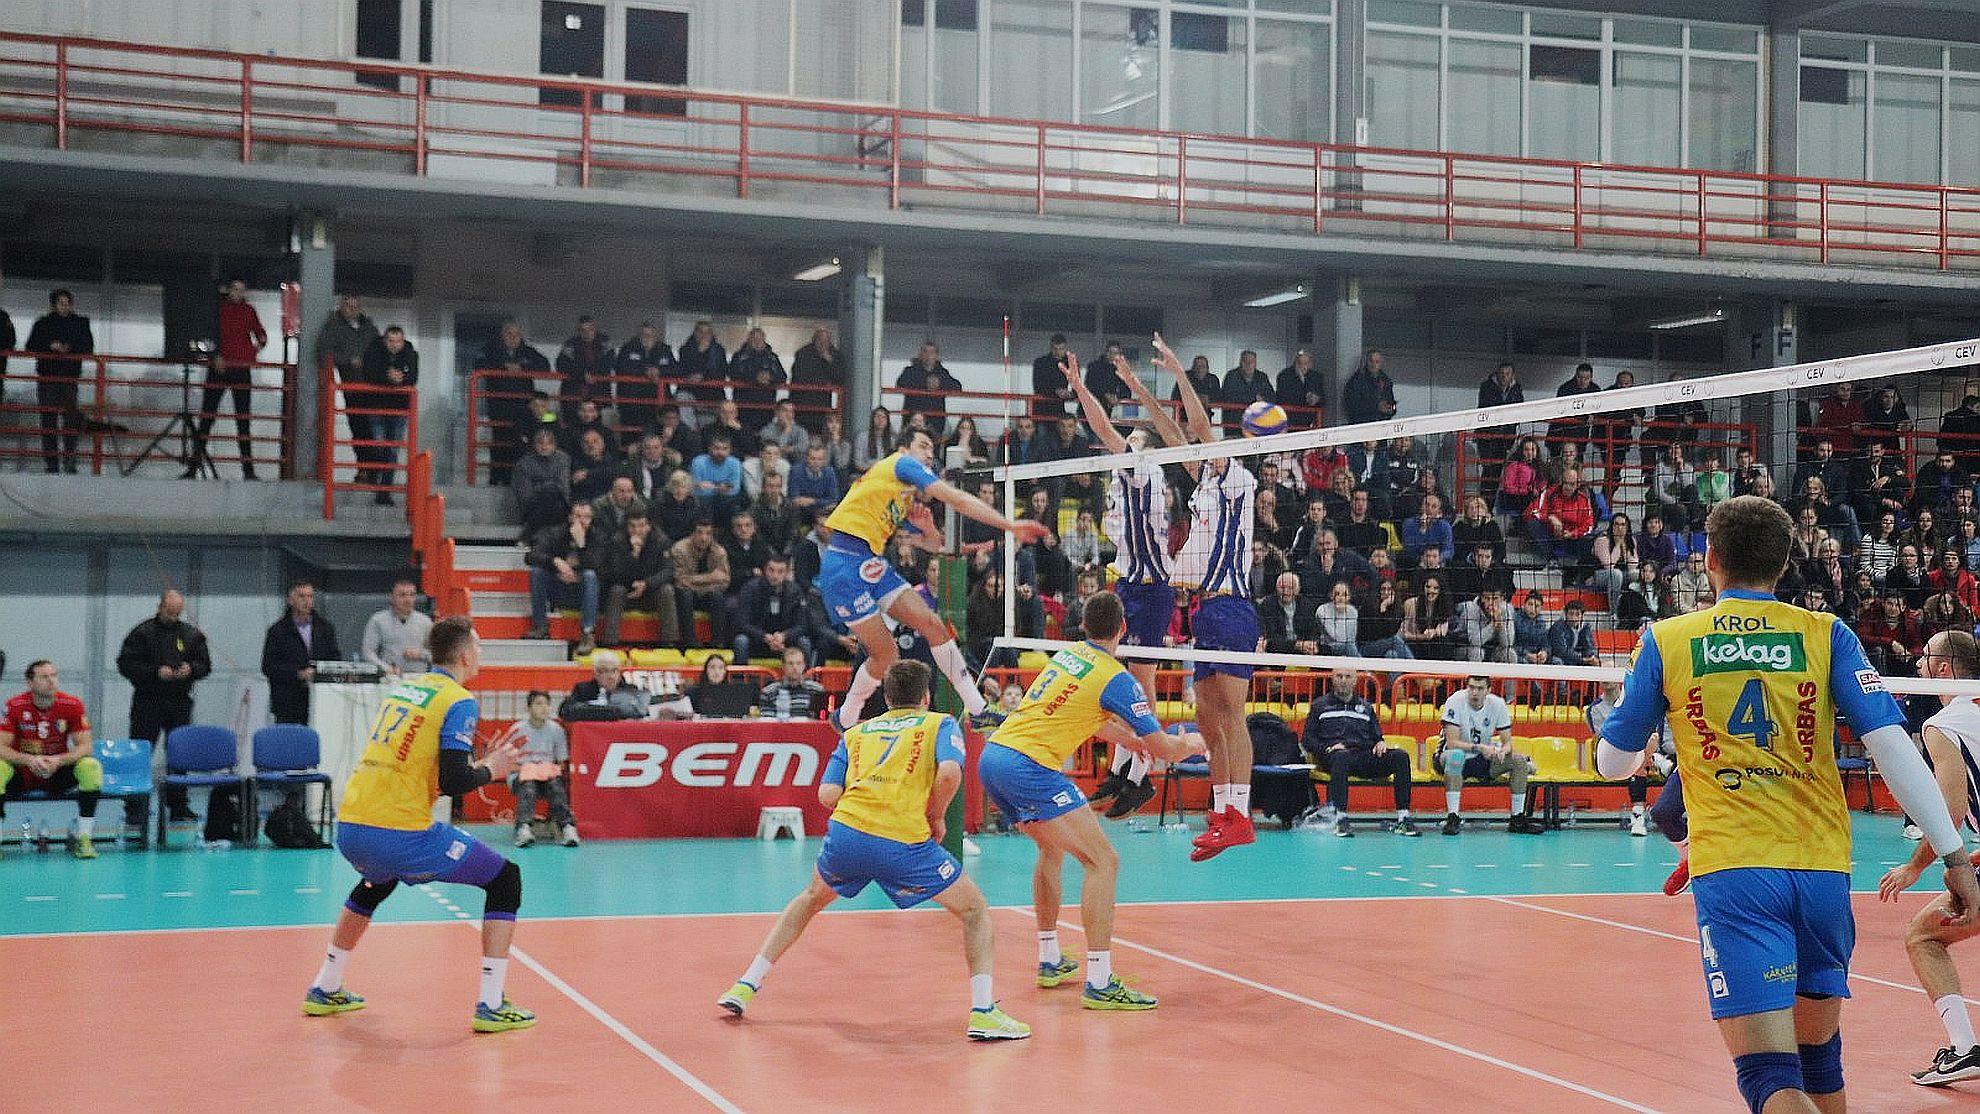 CEV Cup: Jedinstvo Bemax Bijelo Polje (MNE) - SK Posojilnica Aich/Dob (AUT) – FOTO © CEV